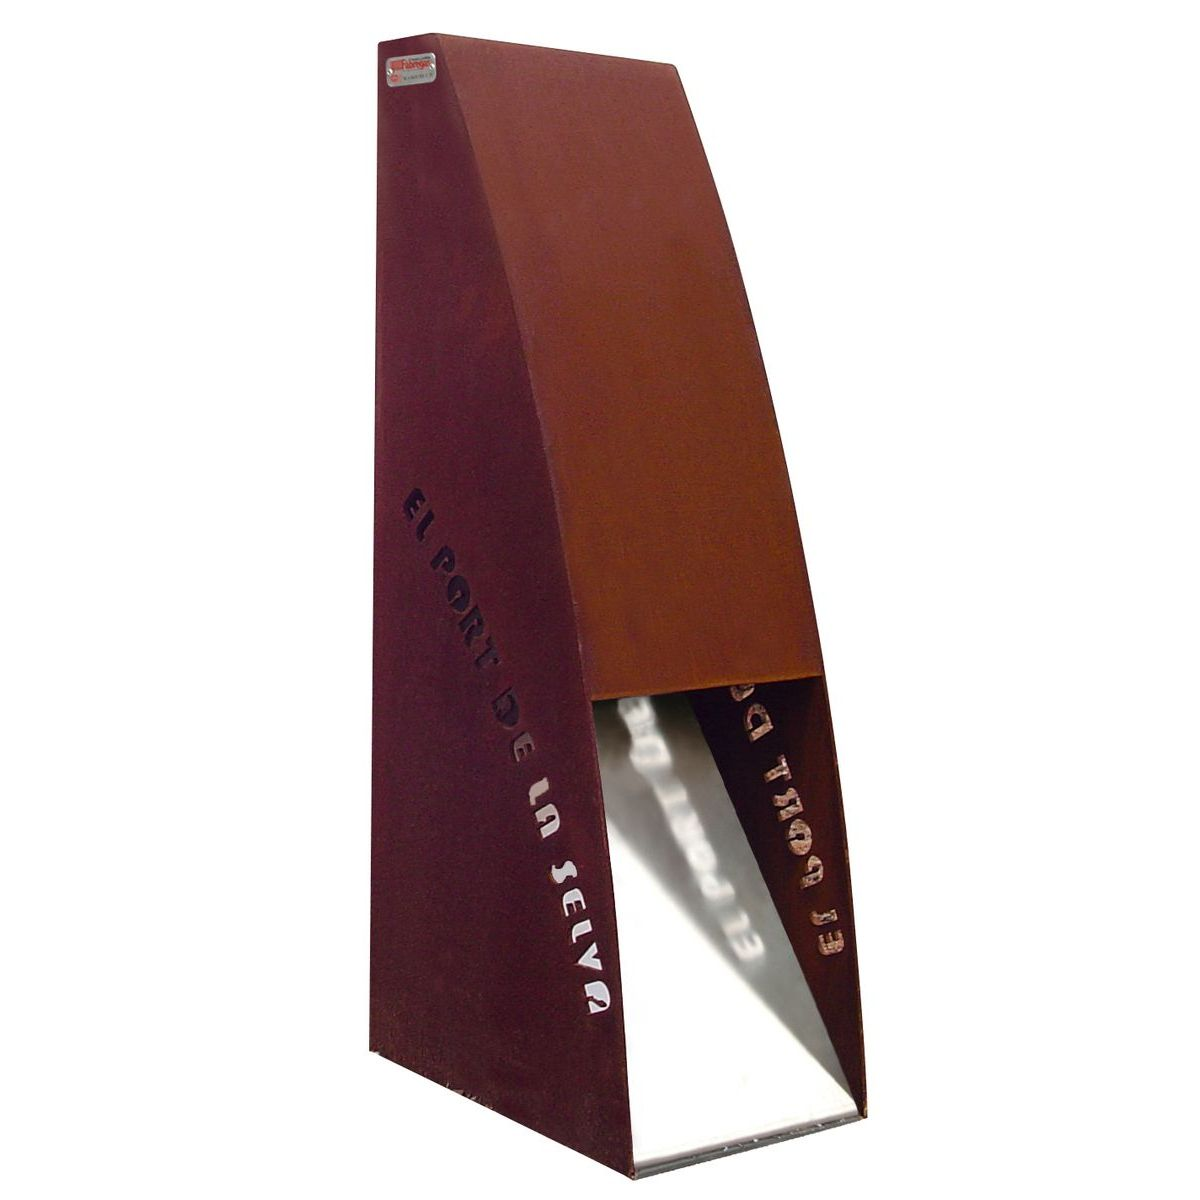 Baliza Escota de acero corten de 125kw - BA-1